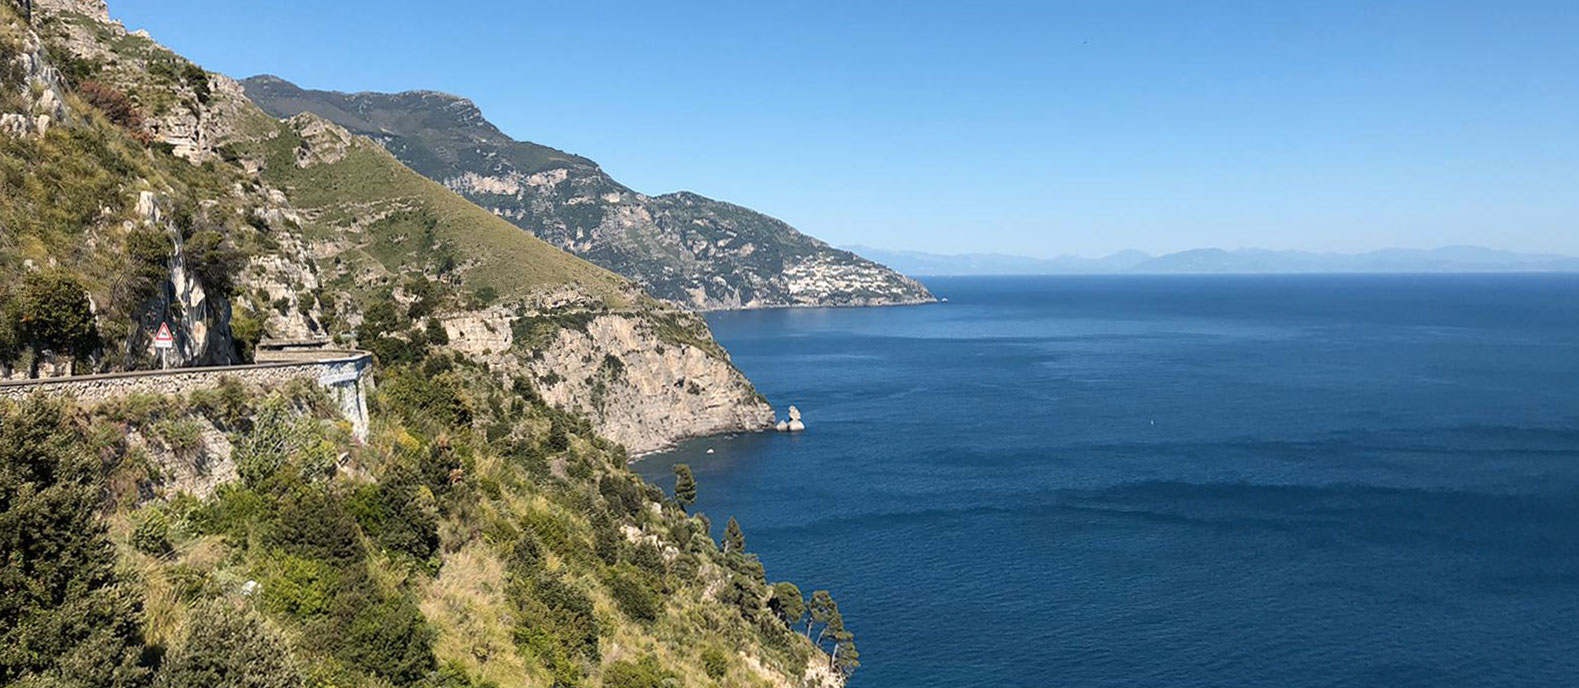 Vacanze benessere in Costiera Amalfitana   Hotel ...